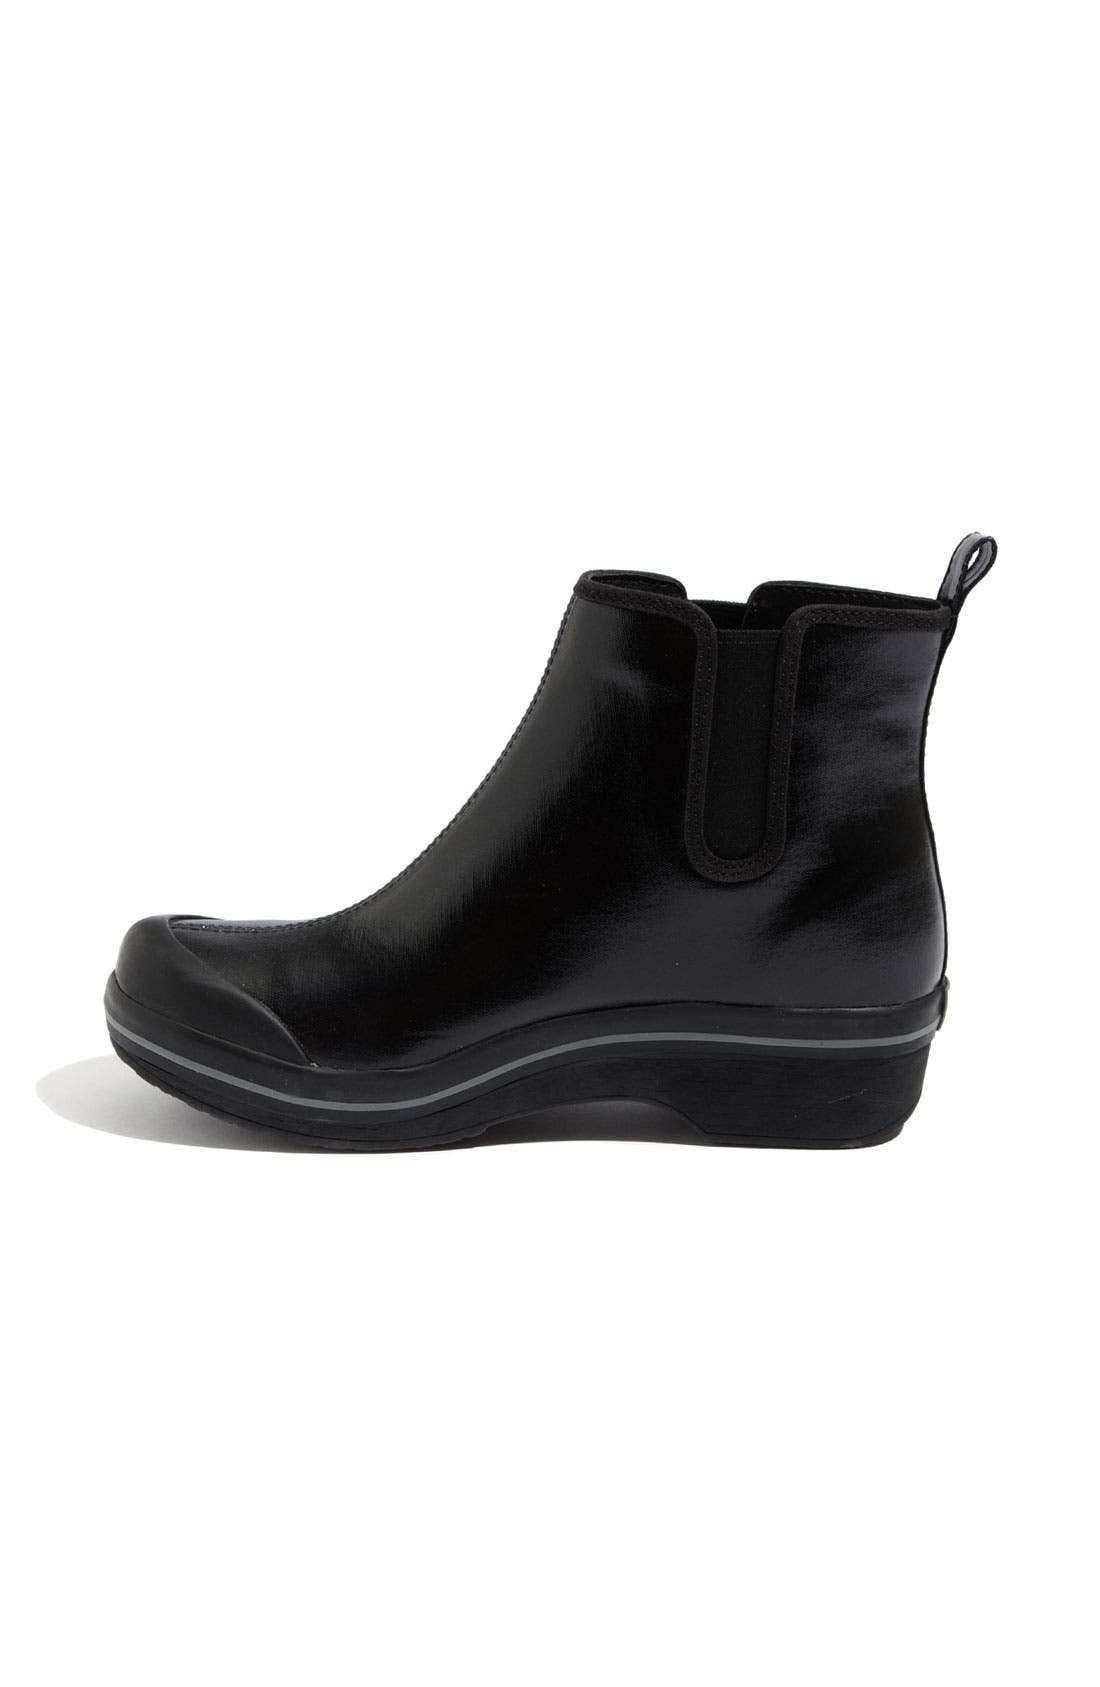 Alternate Image 2  - Dansko 'Vail' Rain Boot